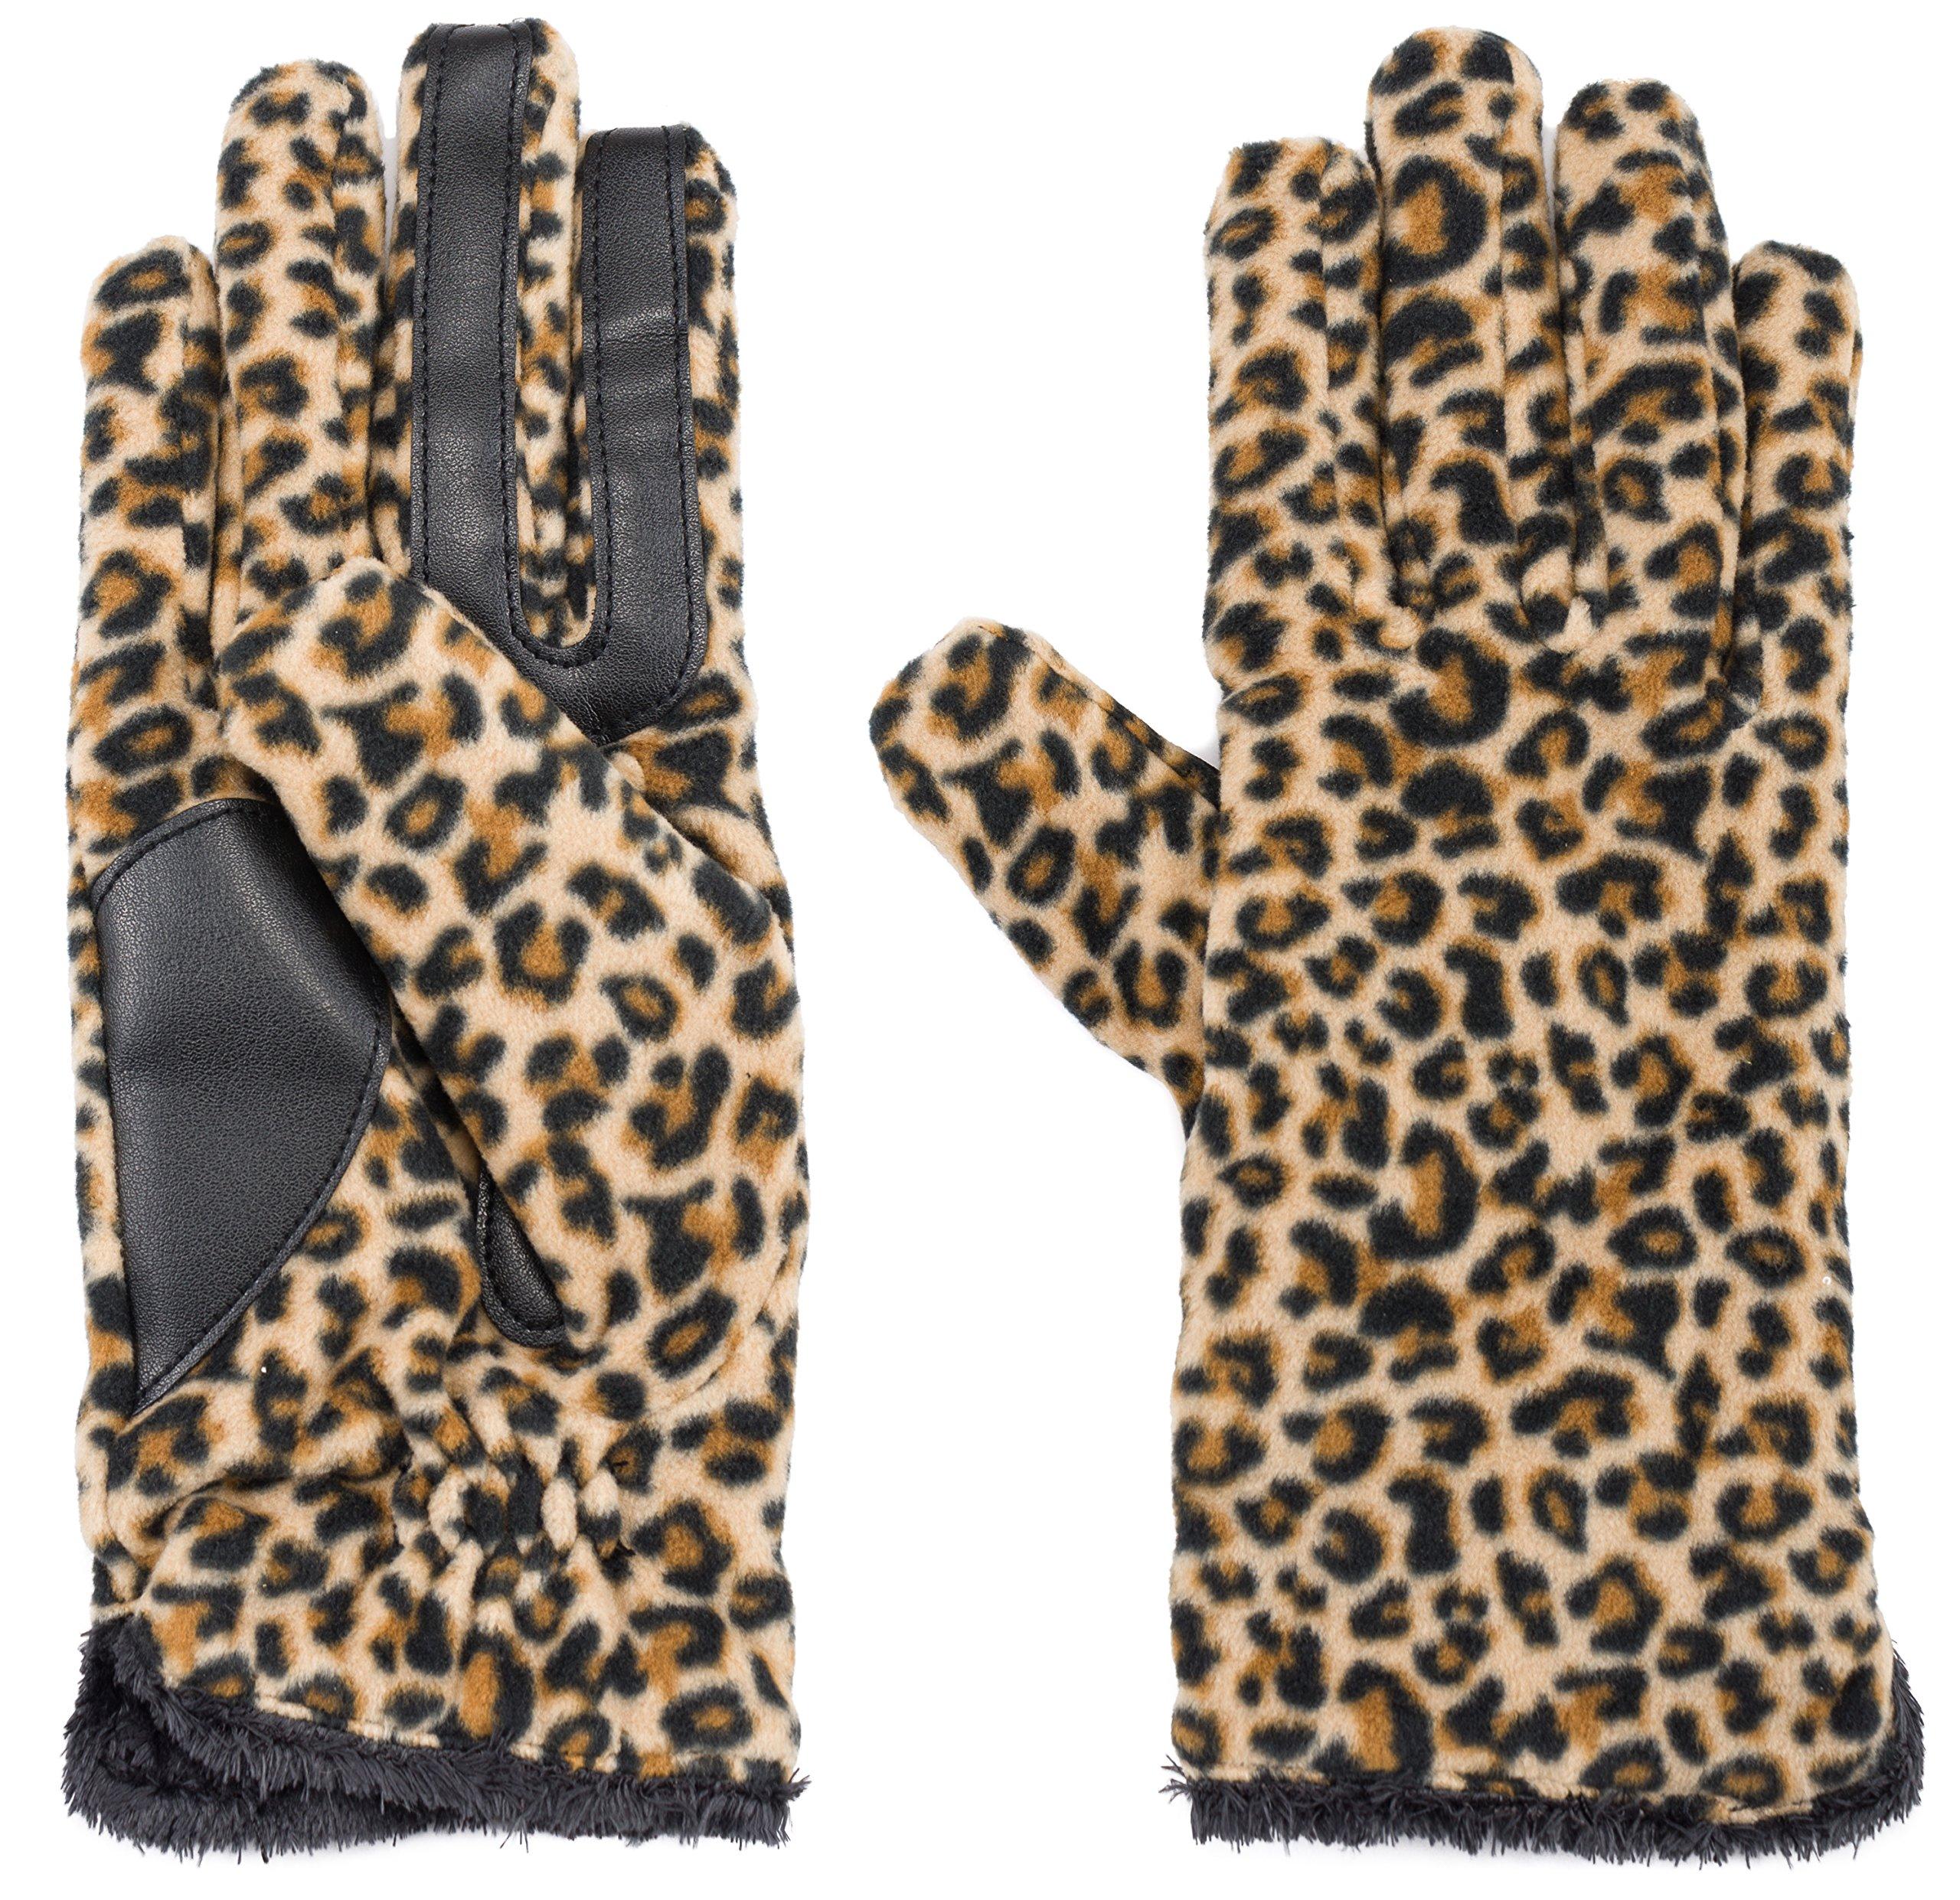 Isotoner Women's Smartouch Fleece Leopard One Size